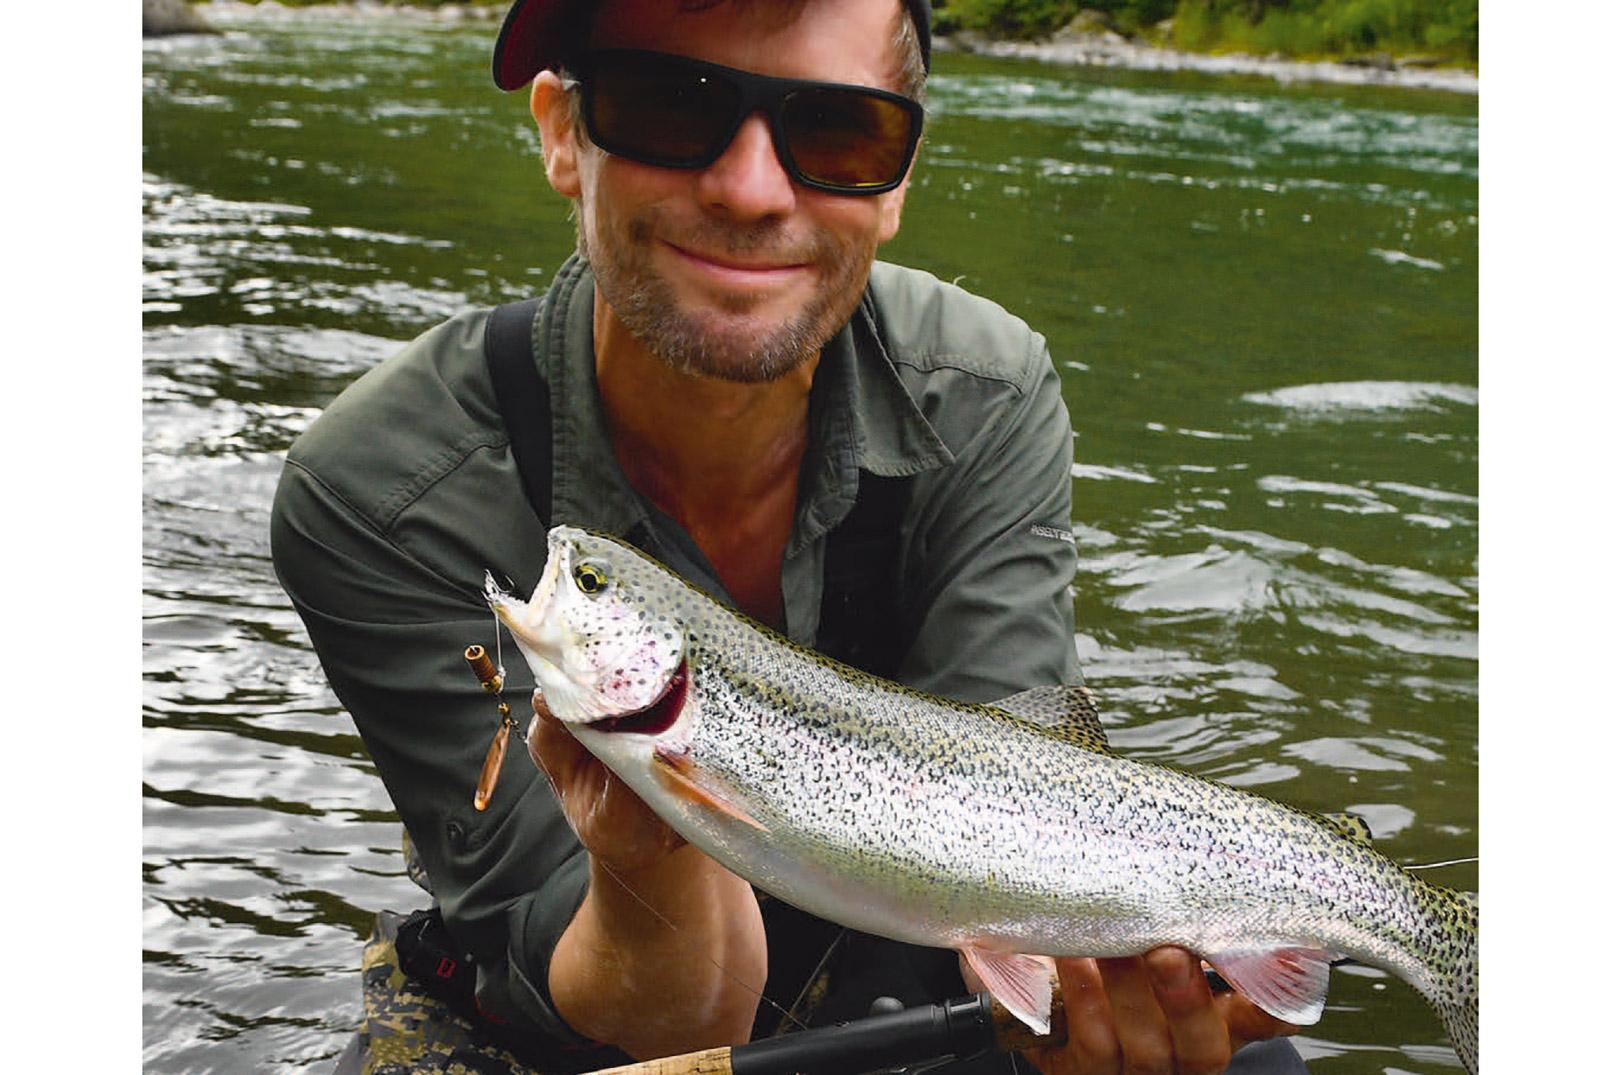 Jens med en fin lille vild regnbue fra Alaskas vildmark